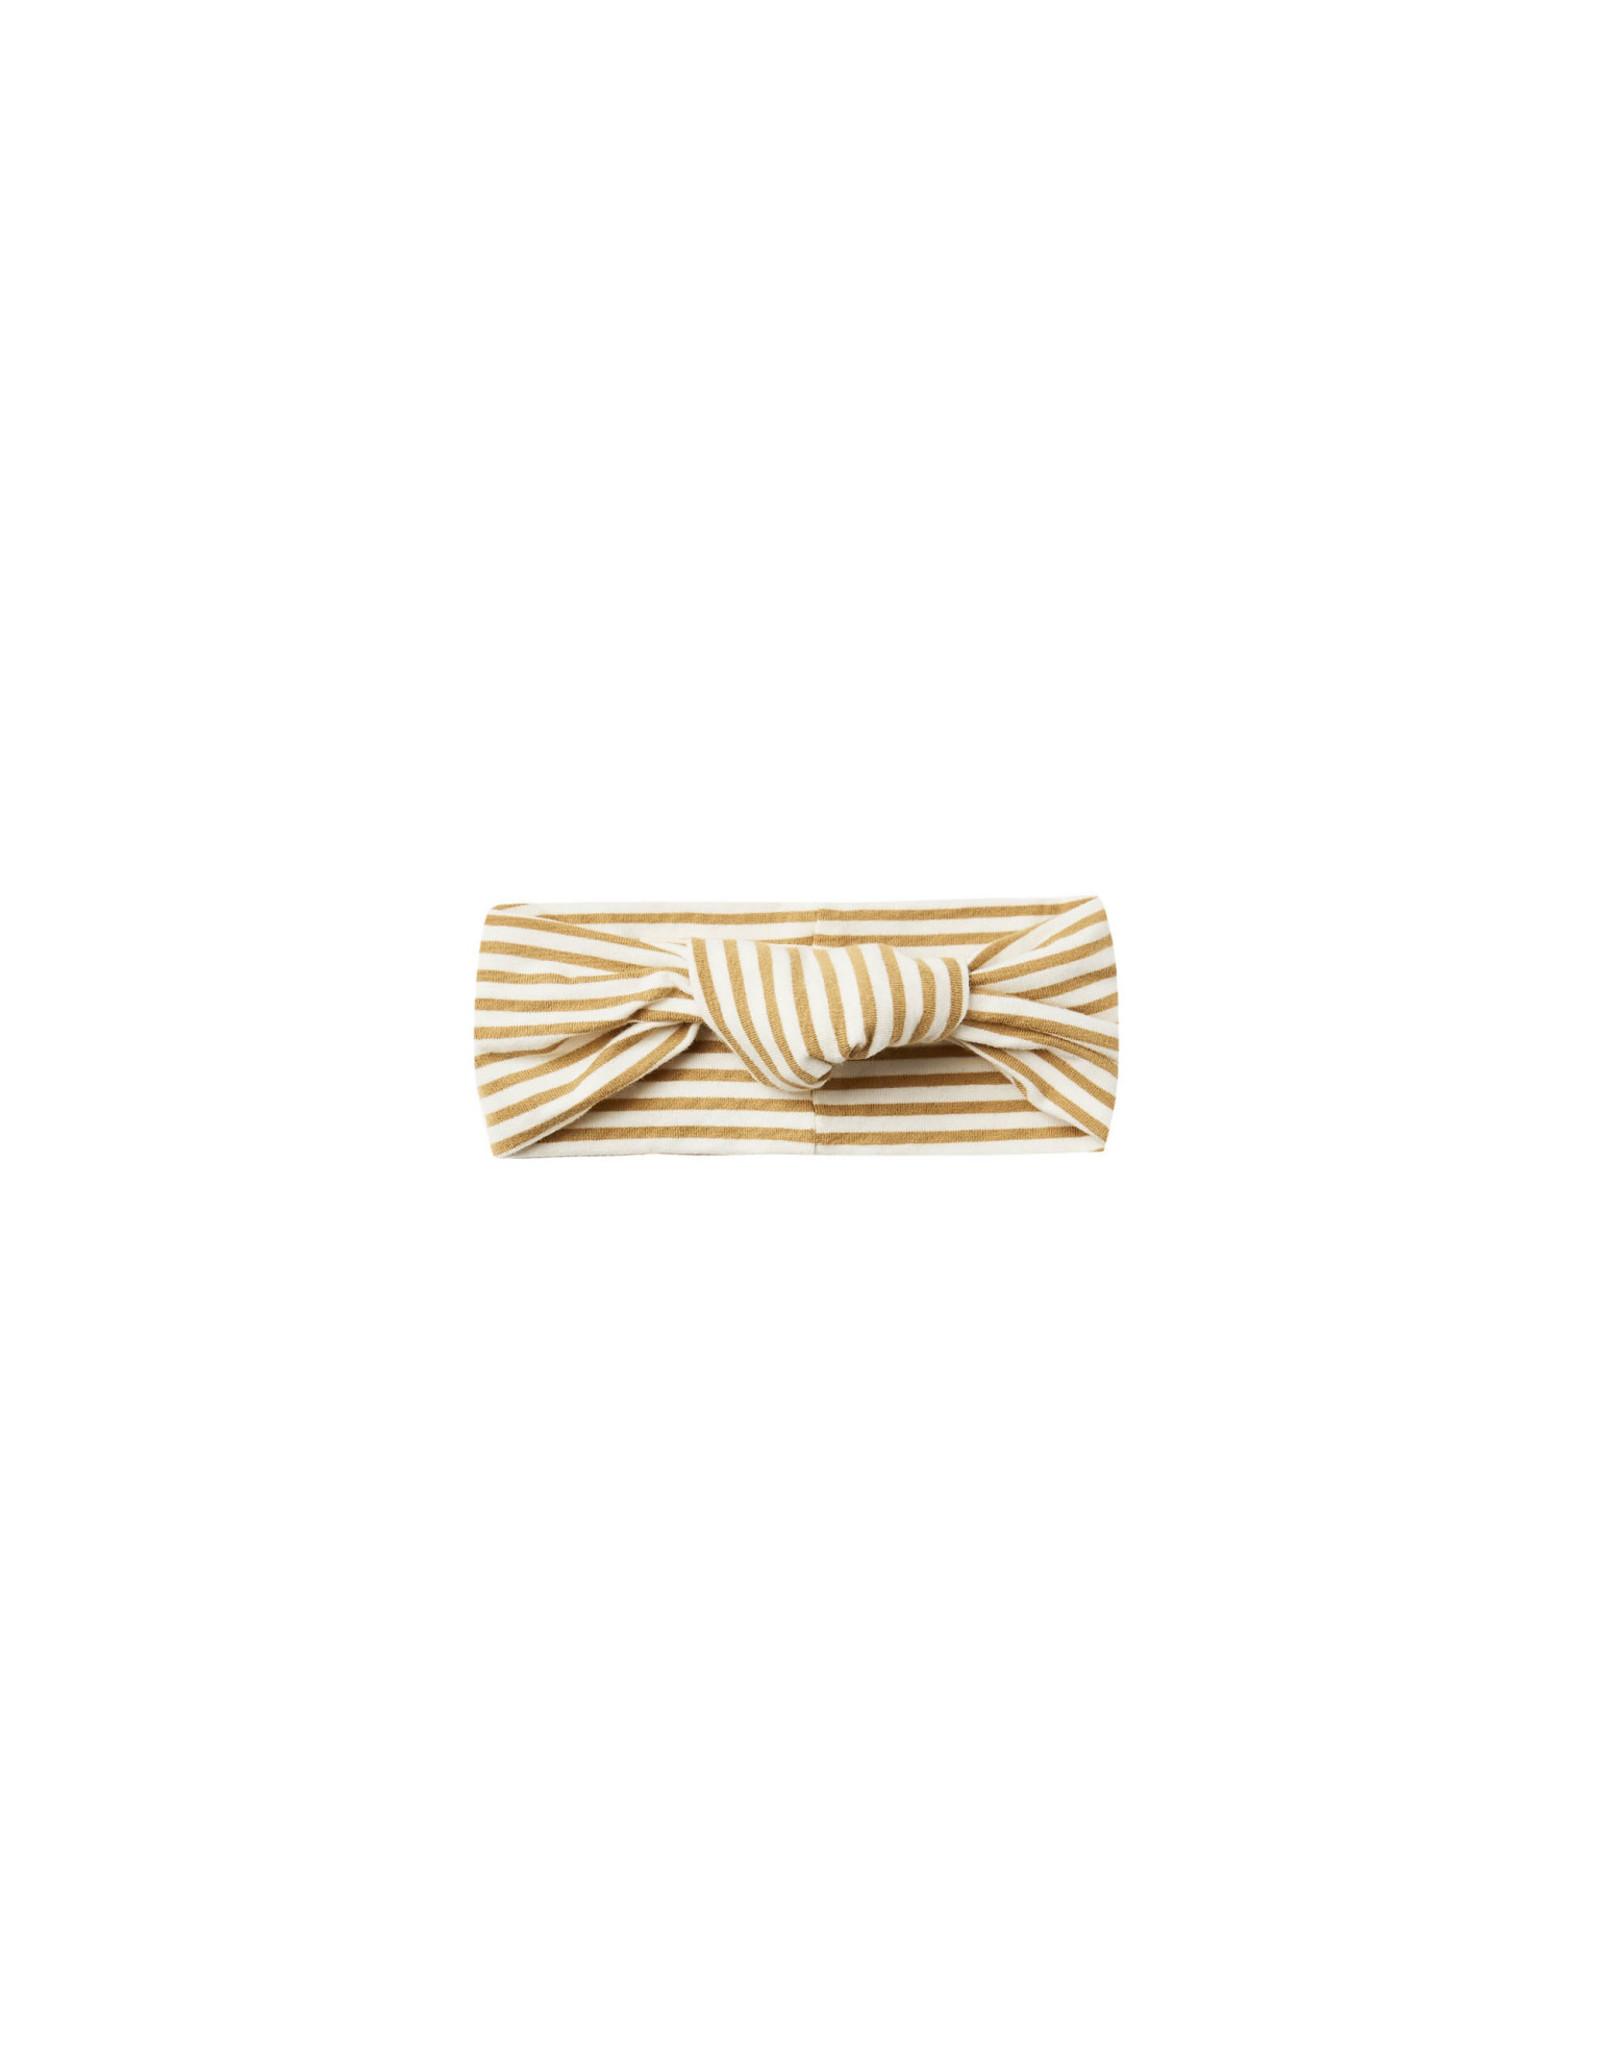 Quincy Mae Quincy Mae Baby Turban, Gold Stripe